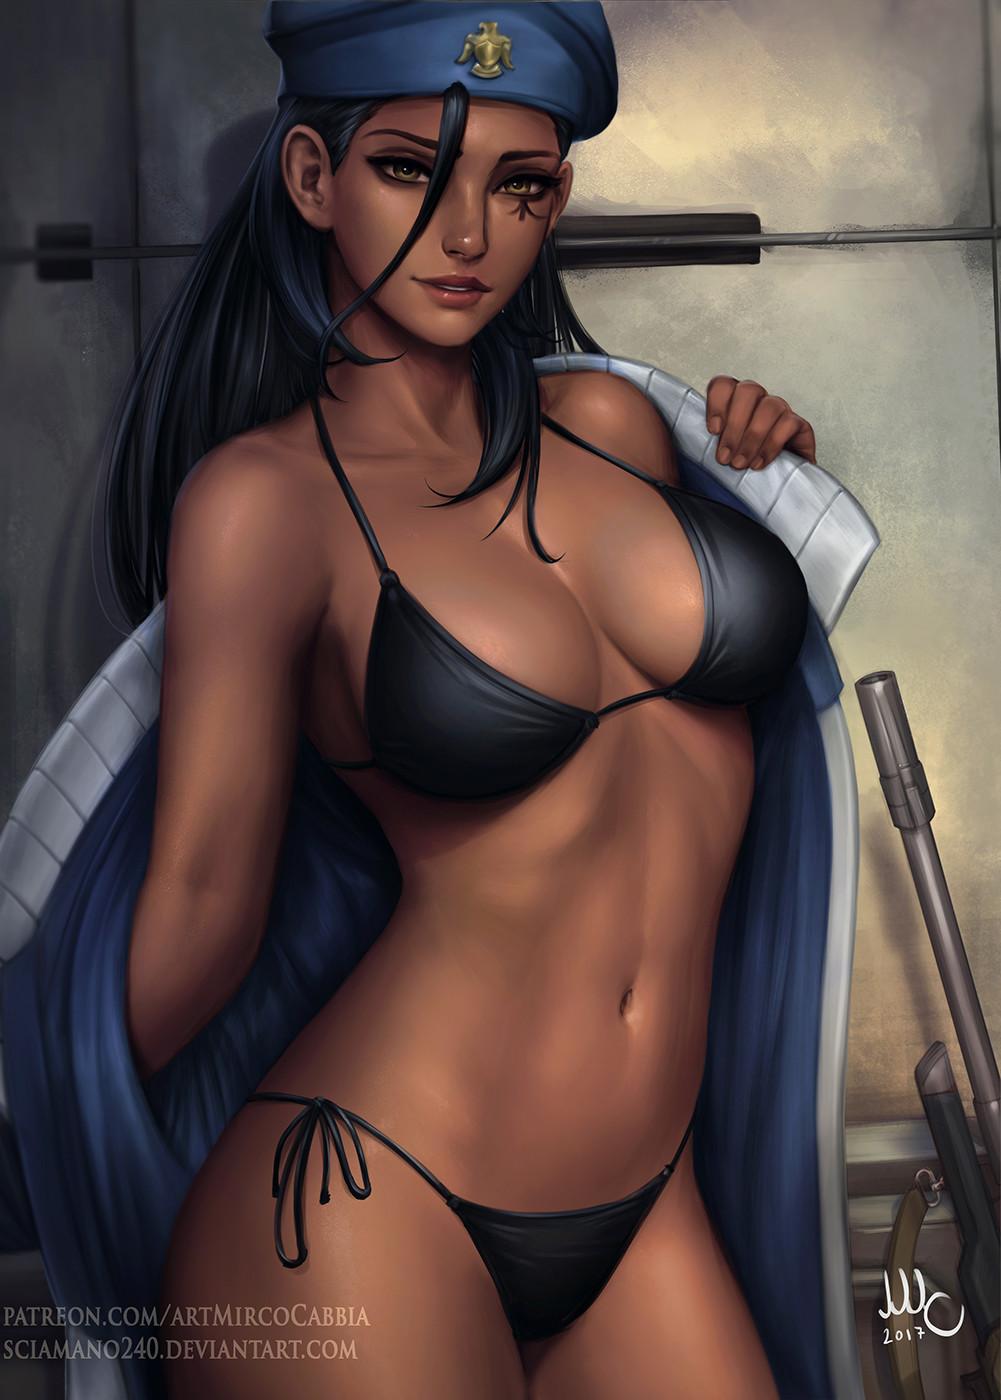 Mirco cabbia ana finale bikini no shadow 1 3